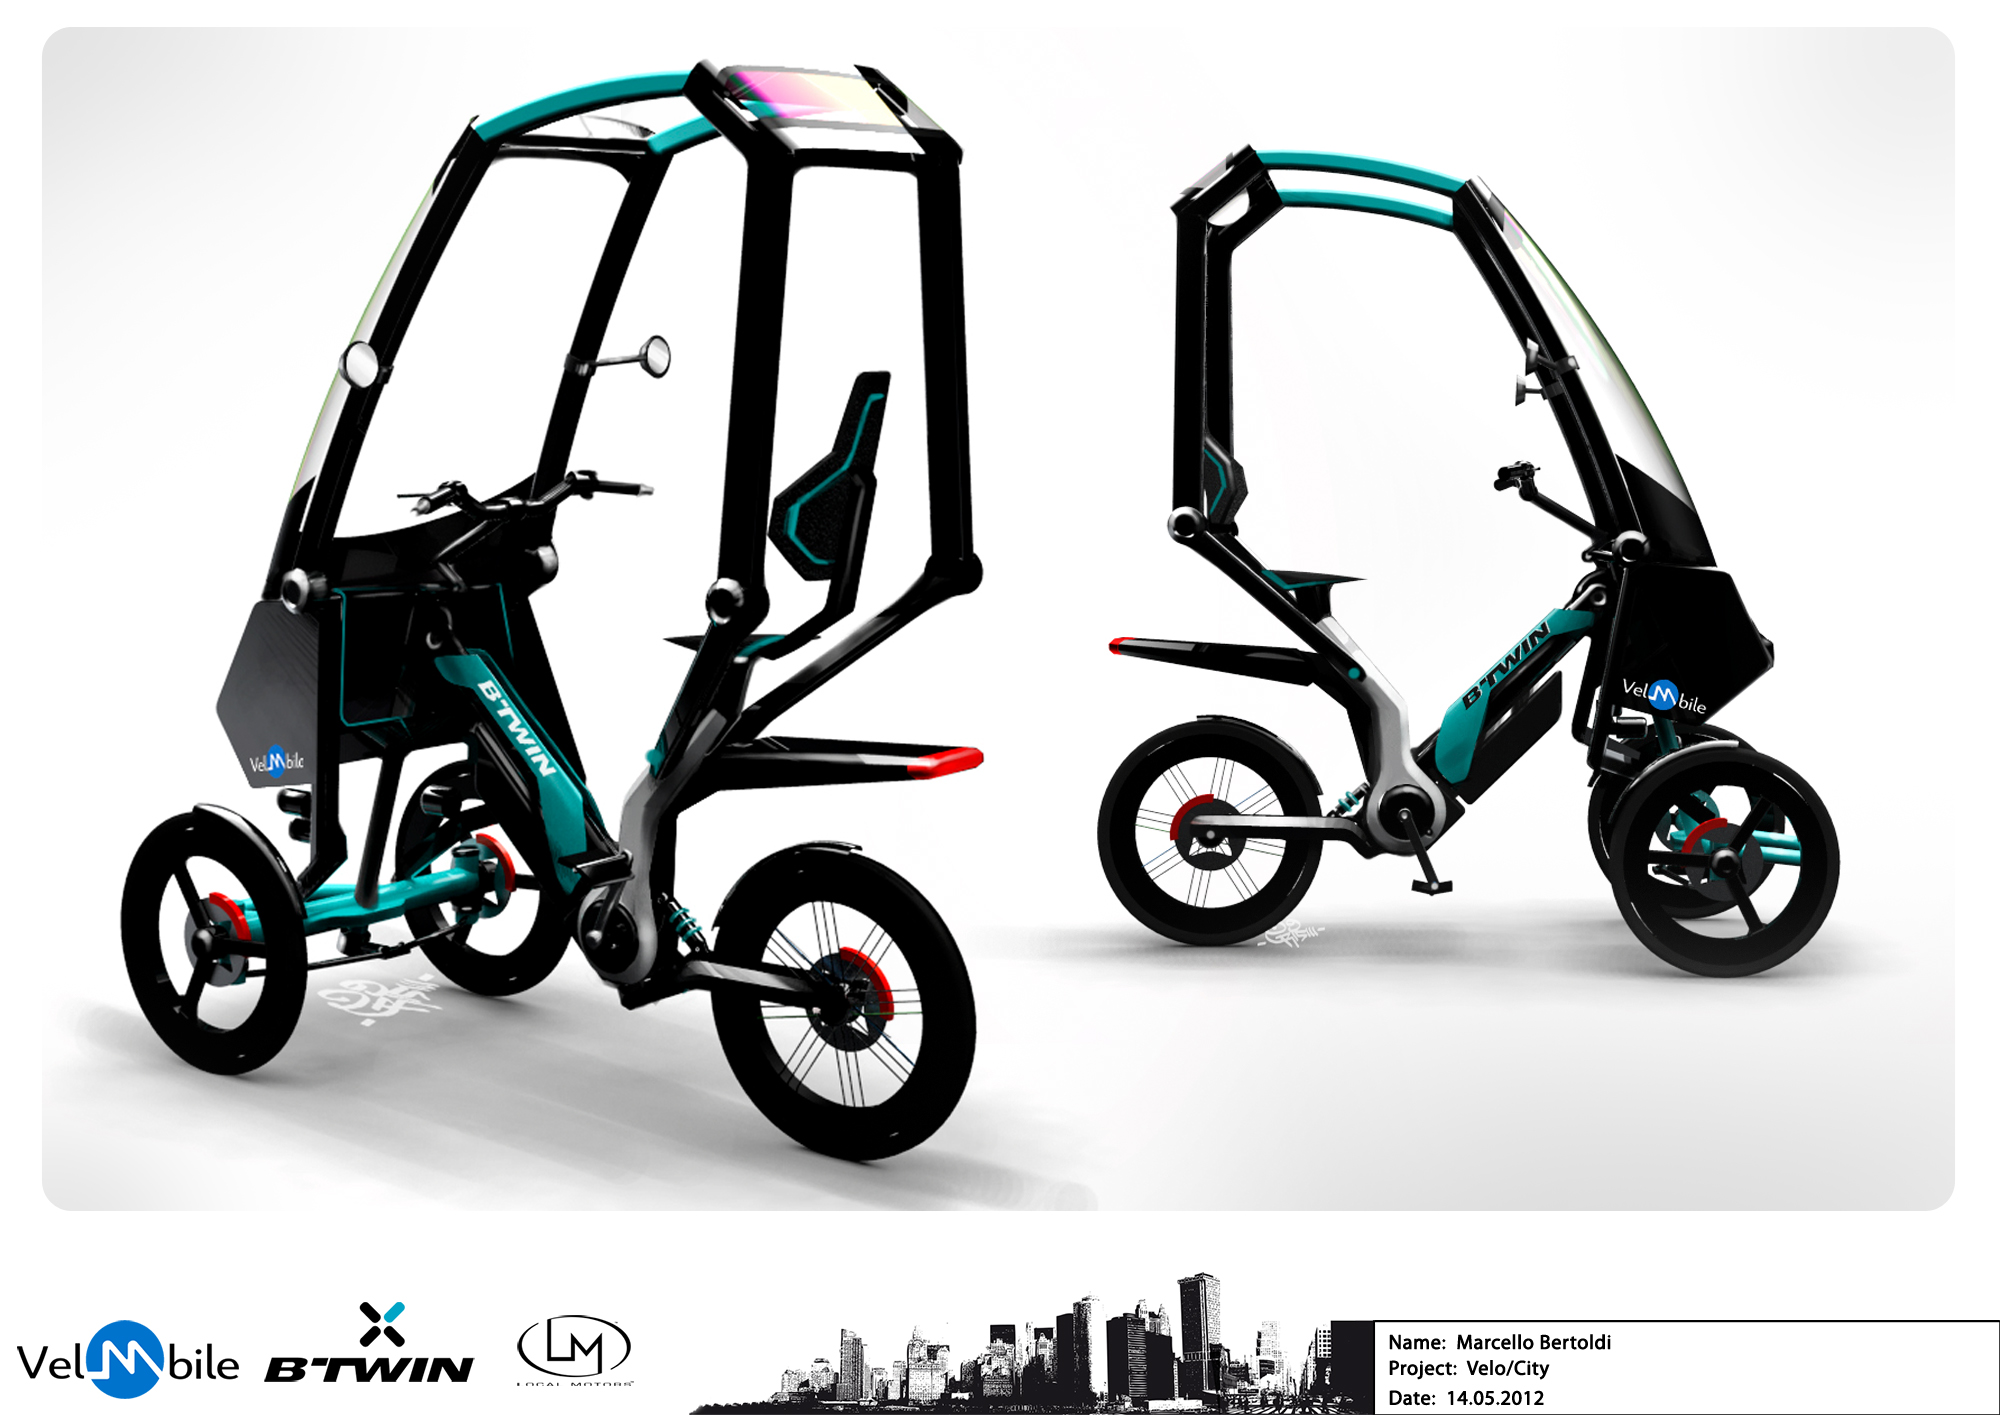 b twin velomobiles. Black Bedroom Furniture Sets. Home Design Ideas